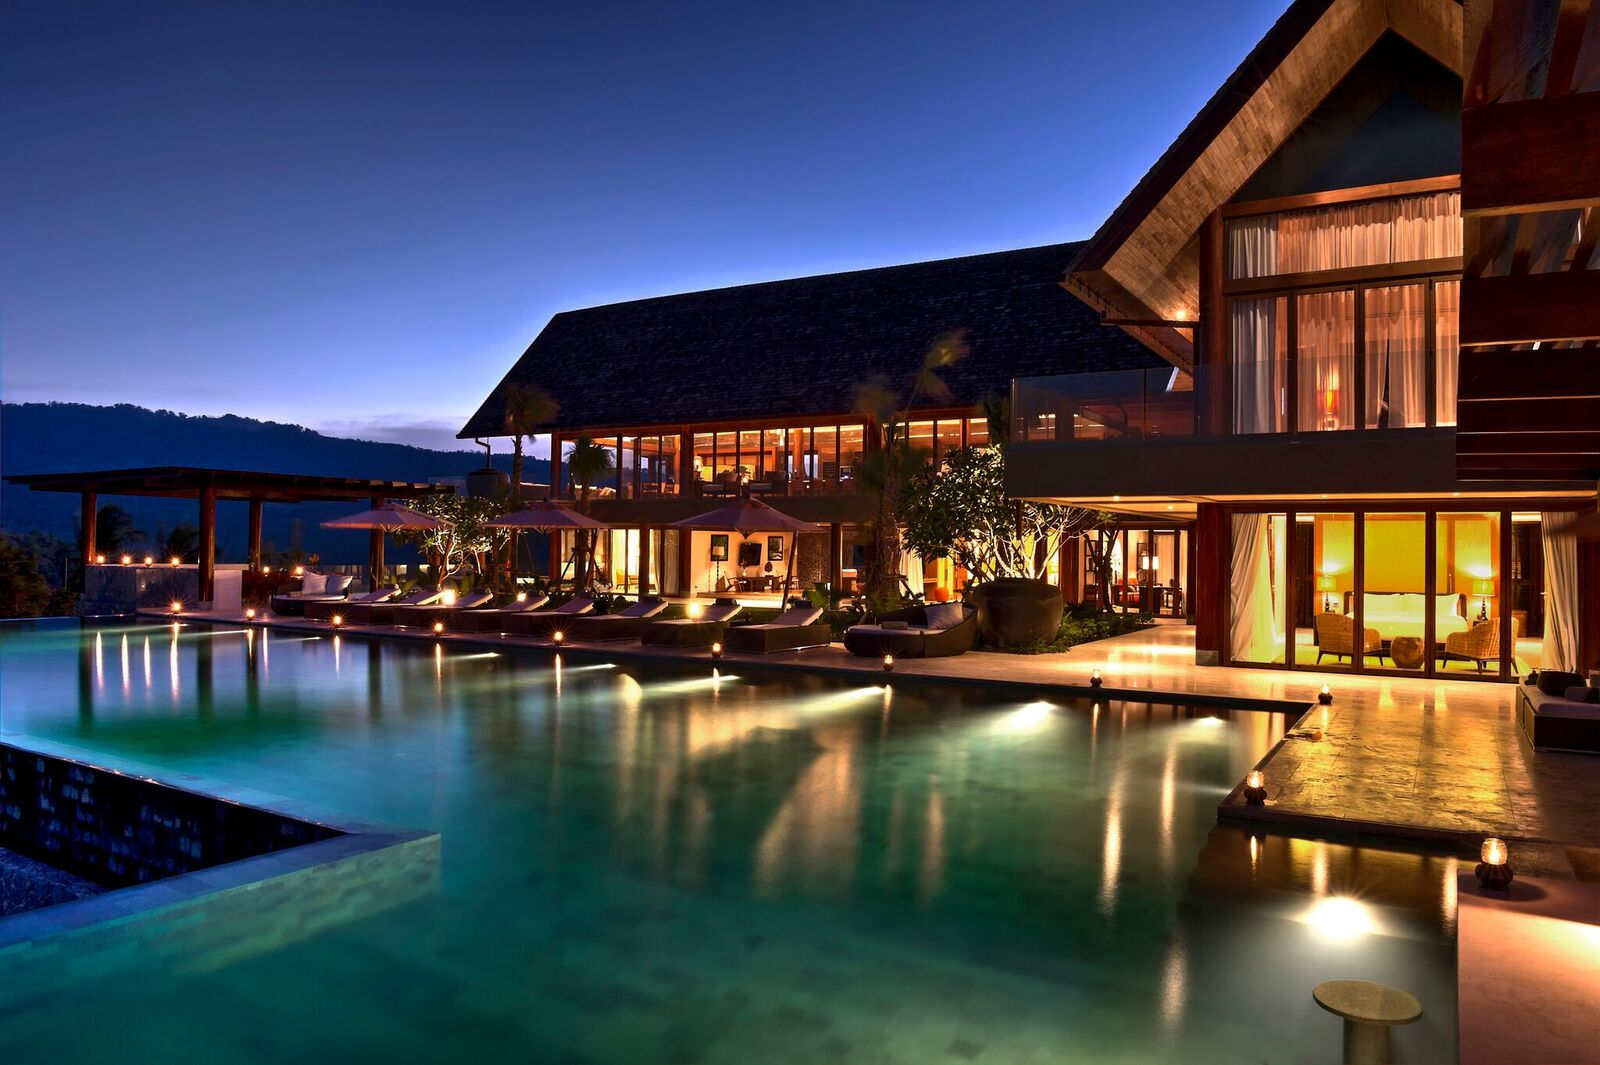 6 Bedroom Sea View Villa with Infinity Pool at Bophut Ko Samui